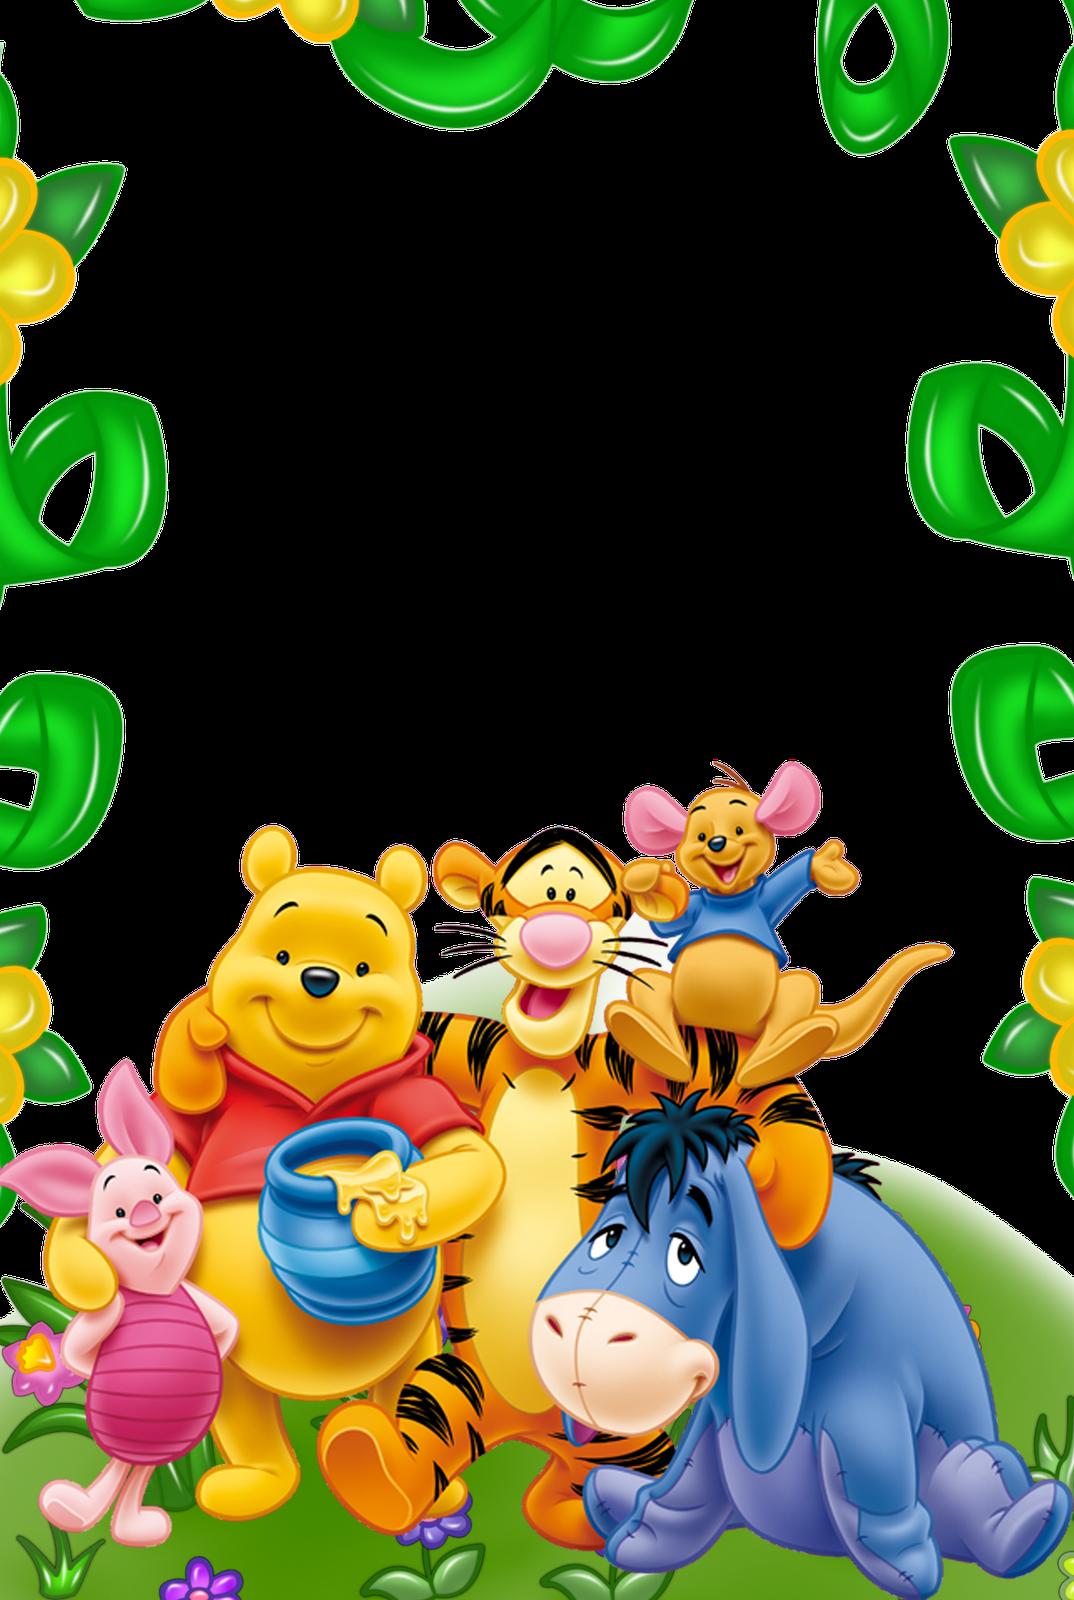 High school friends clipart banner Winnie The Pooh And Friends Clipart - Clip Art. Net banner